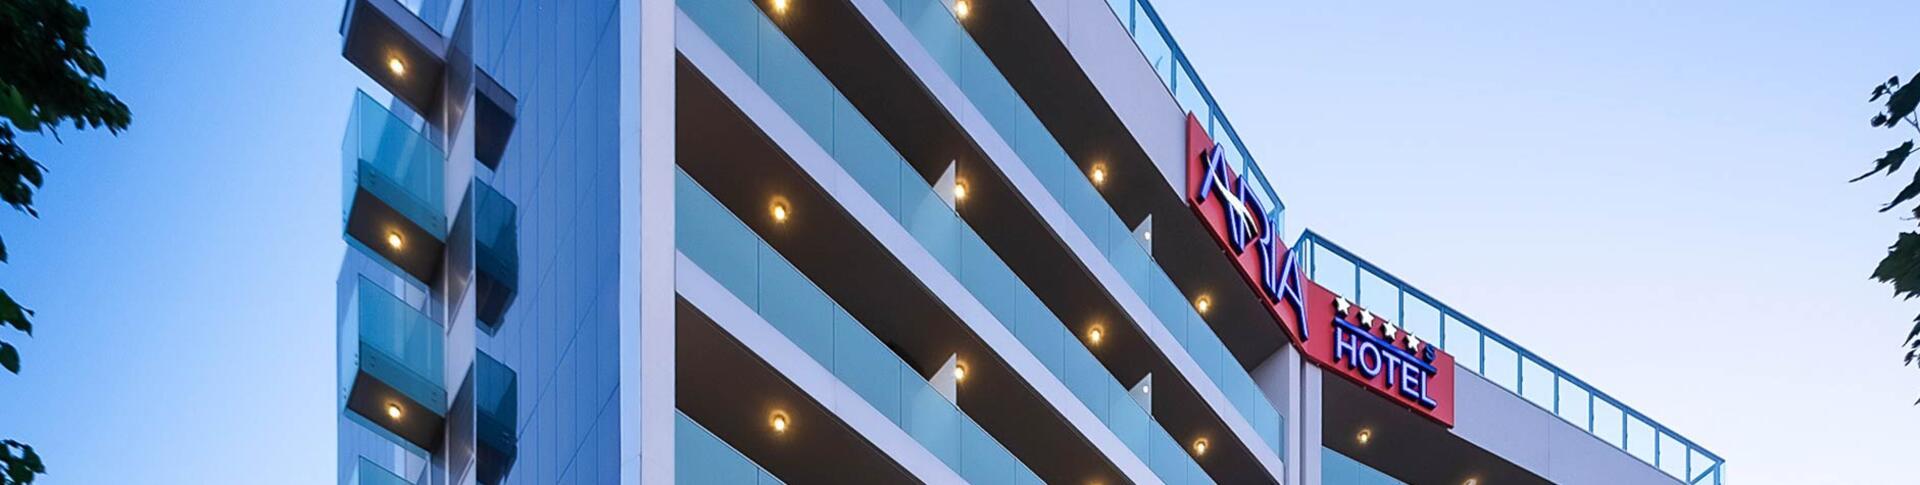 ariahotel it halloween-in-hotel-4-stelle-superiore-a-rimini 013